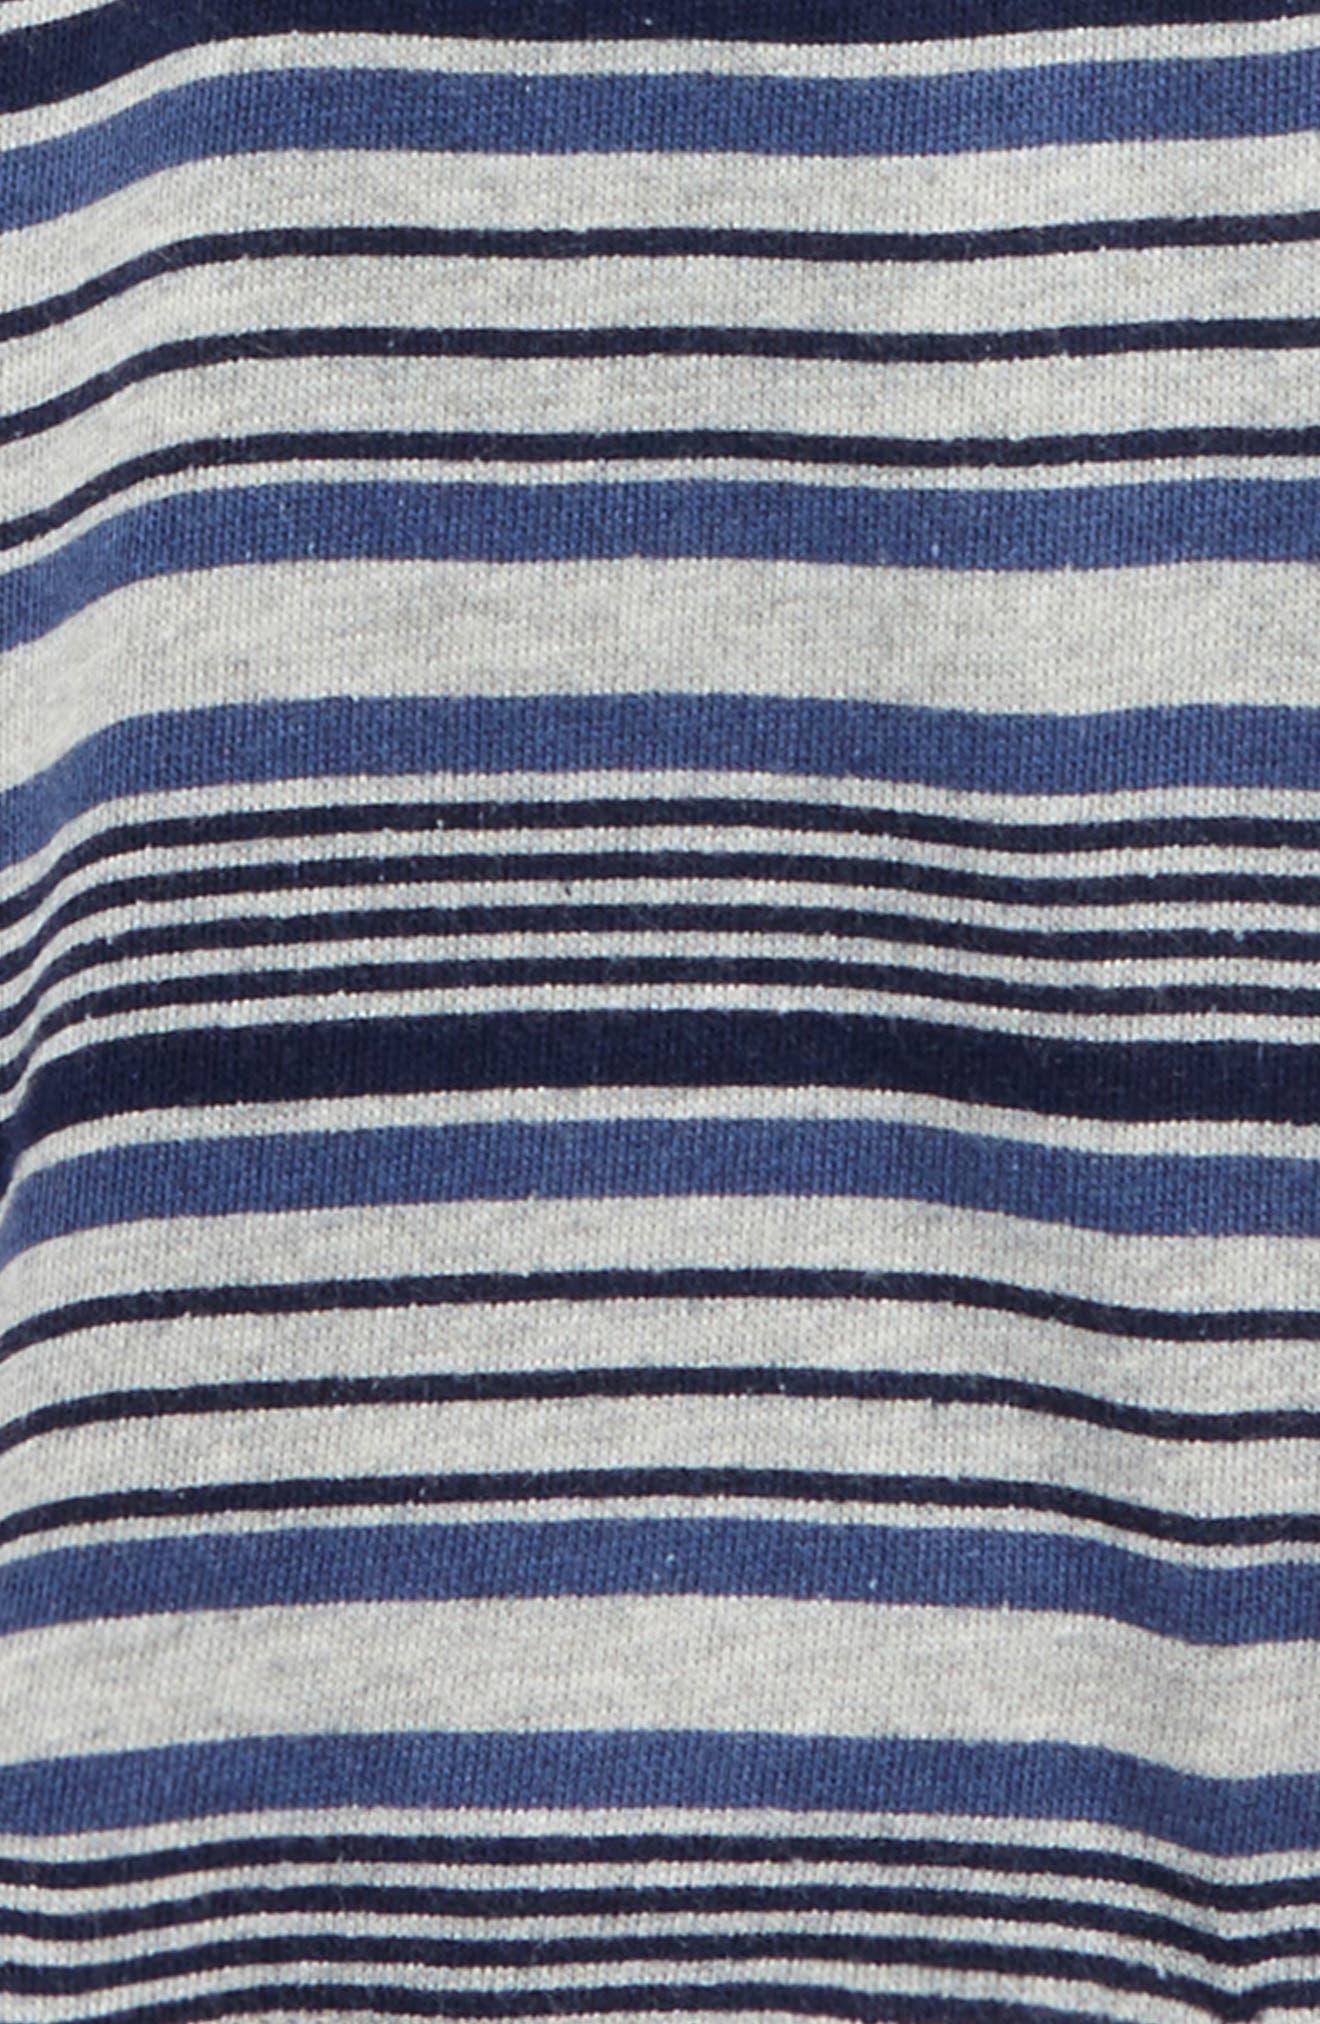 Henley Shirt & Knit Shorts Set,                             Alternate thumbnail 2, color,                             Indigo Sky